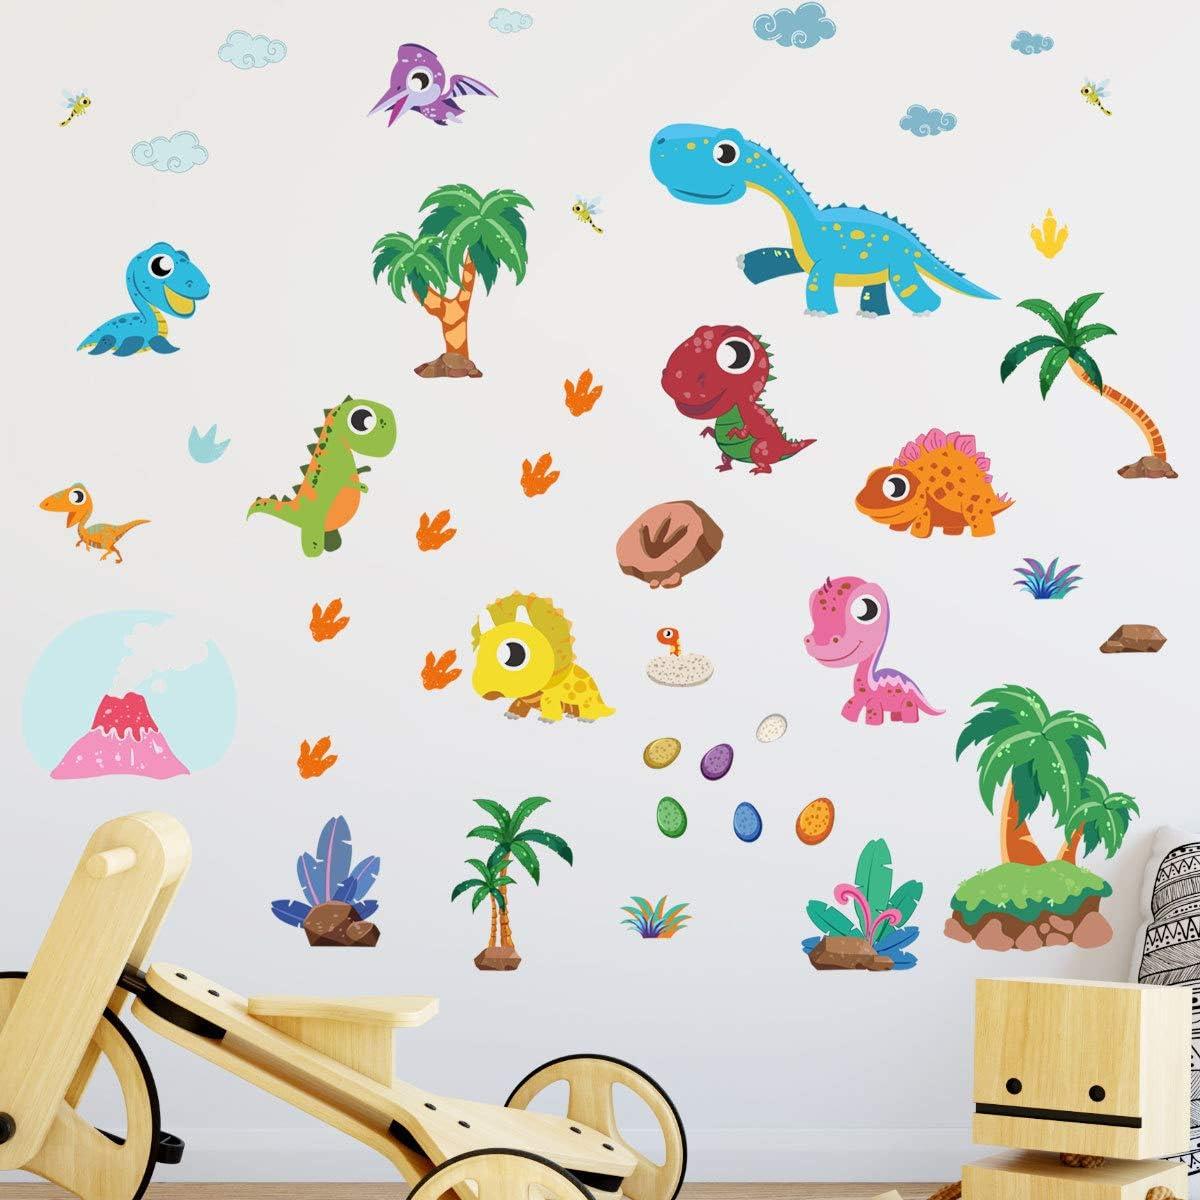 NPNG Nursery Cute Dinosaur Coconut Tree Decor Wall Decor Art Baby Room Bedroom Decoration Children Gift Dorm Room Wall Sticker